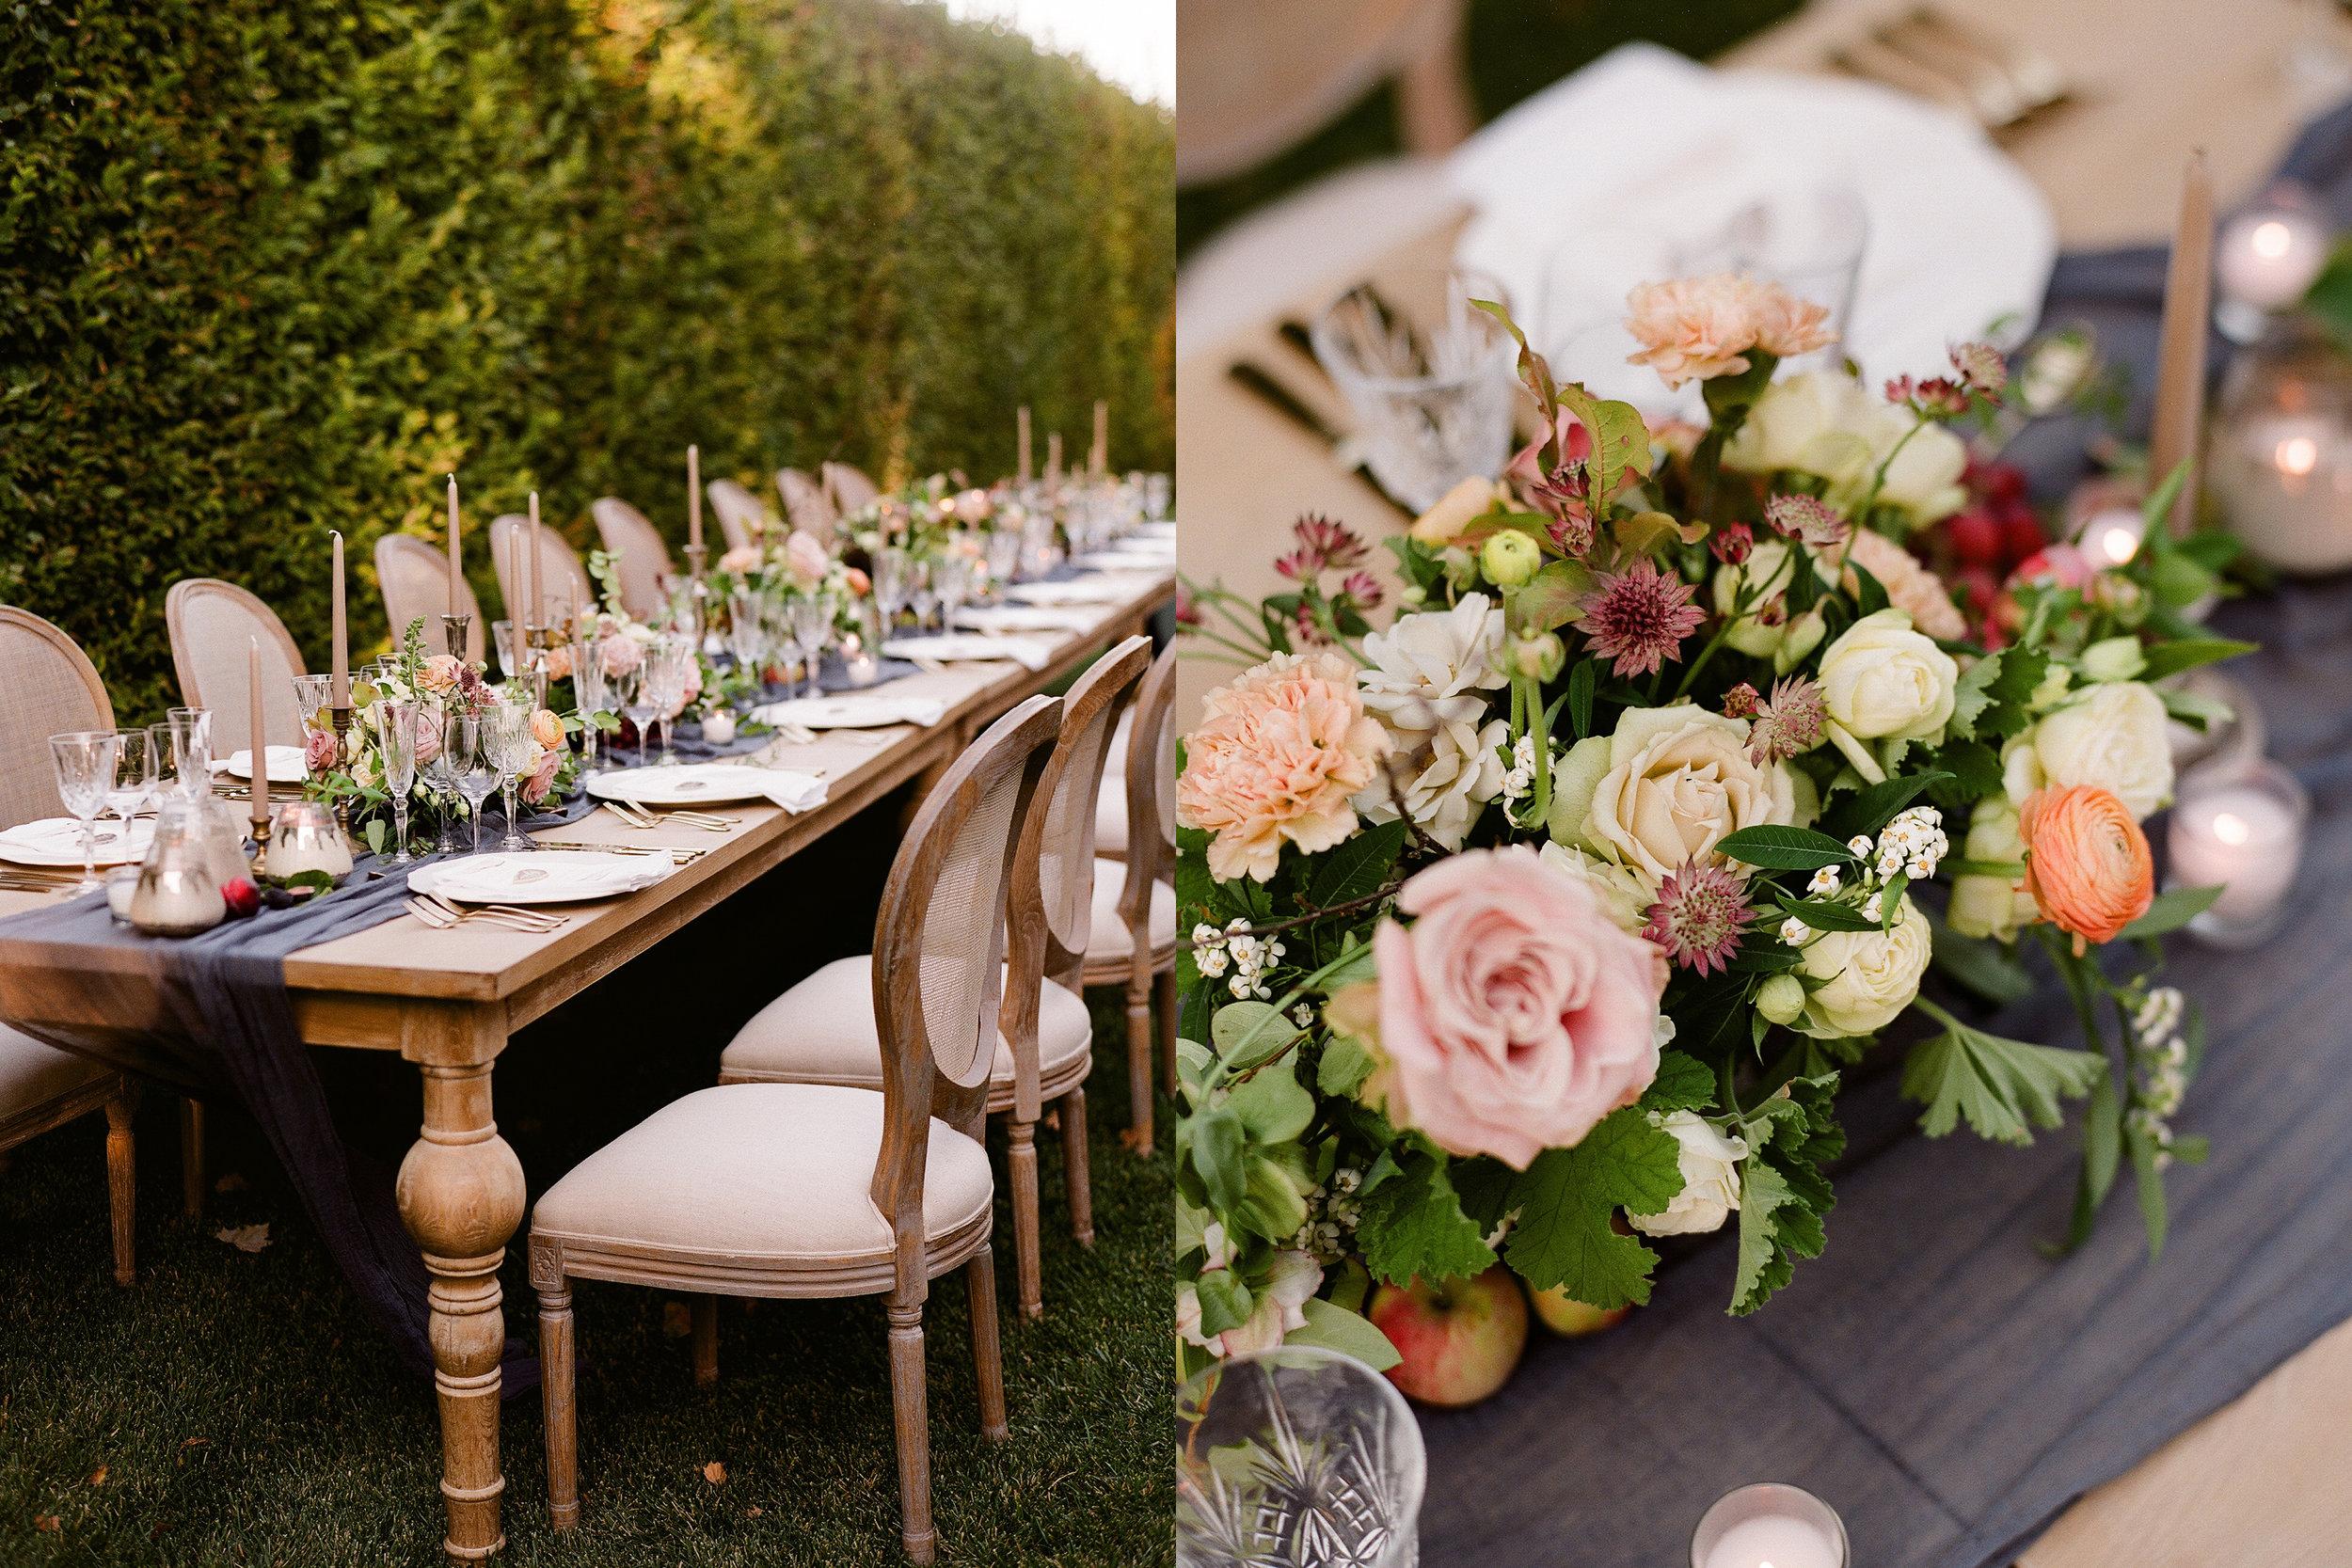 santa-barbara-elopement-elope-wedding-planner-planning-coordinator-day-of-intimate-event-design-kestrel-park-santa-ynez-english-country-estate-garden-castle (27).jpg